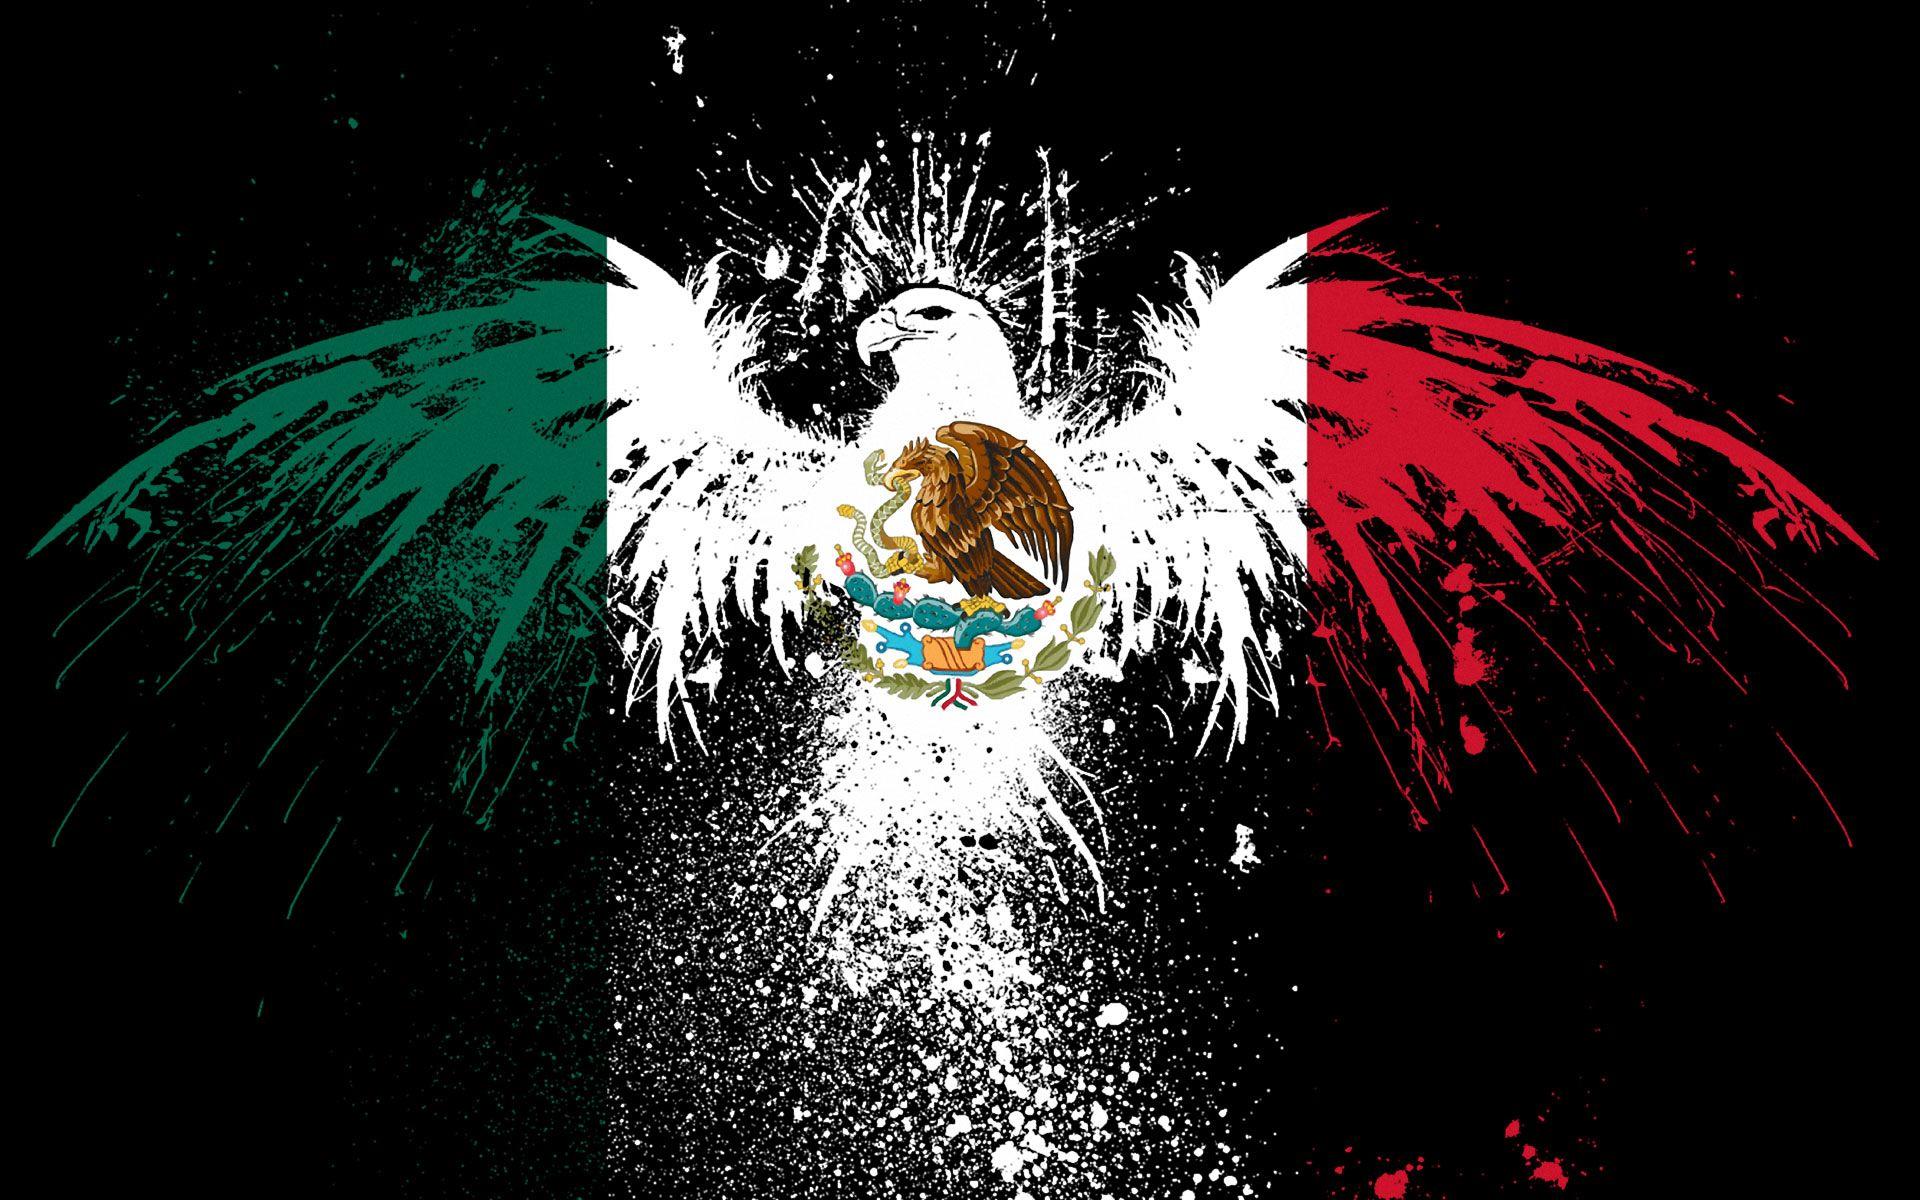 Pin by liljoker13 on blue rose Pinterest Mexico wallpaper 1920x1200